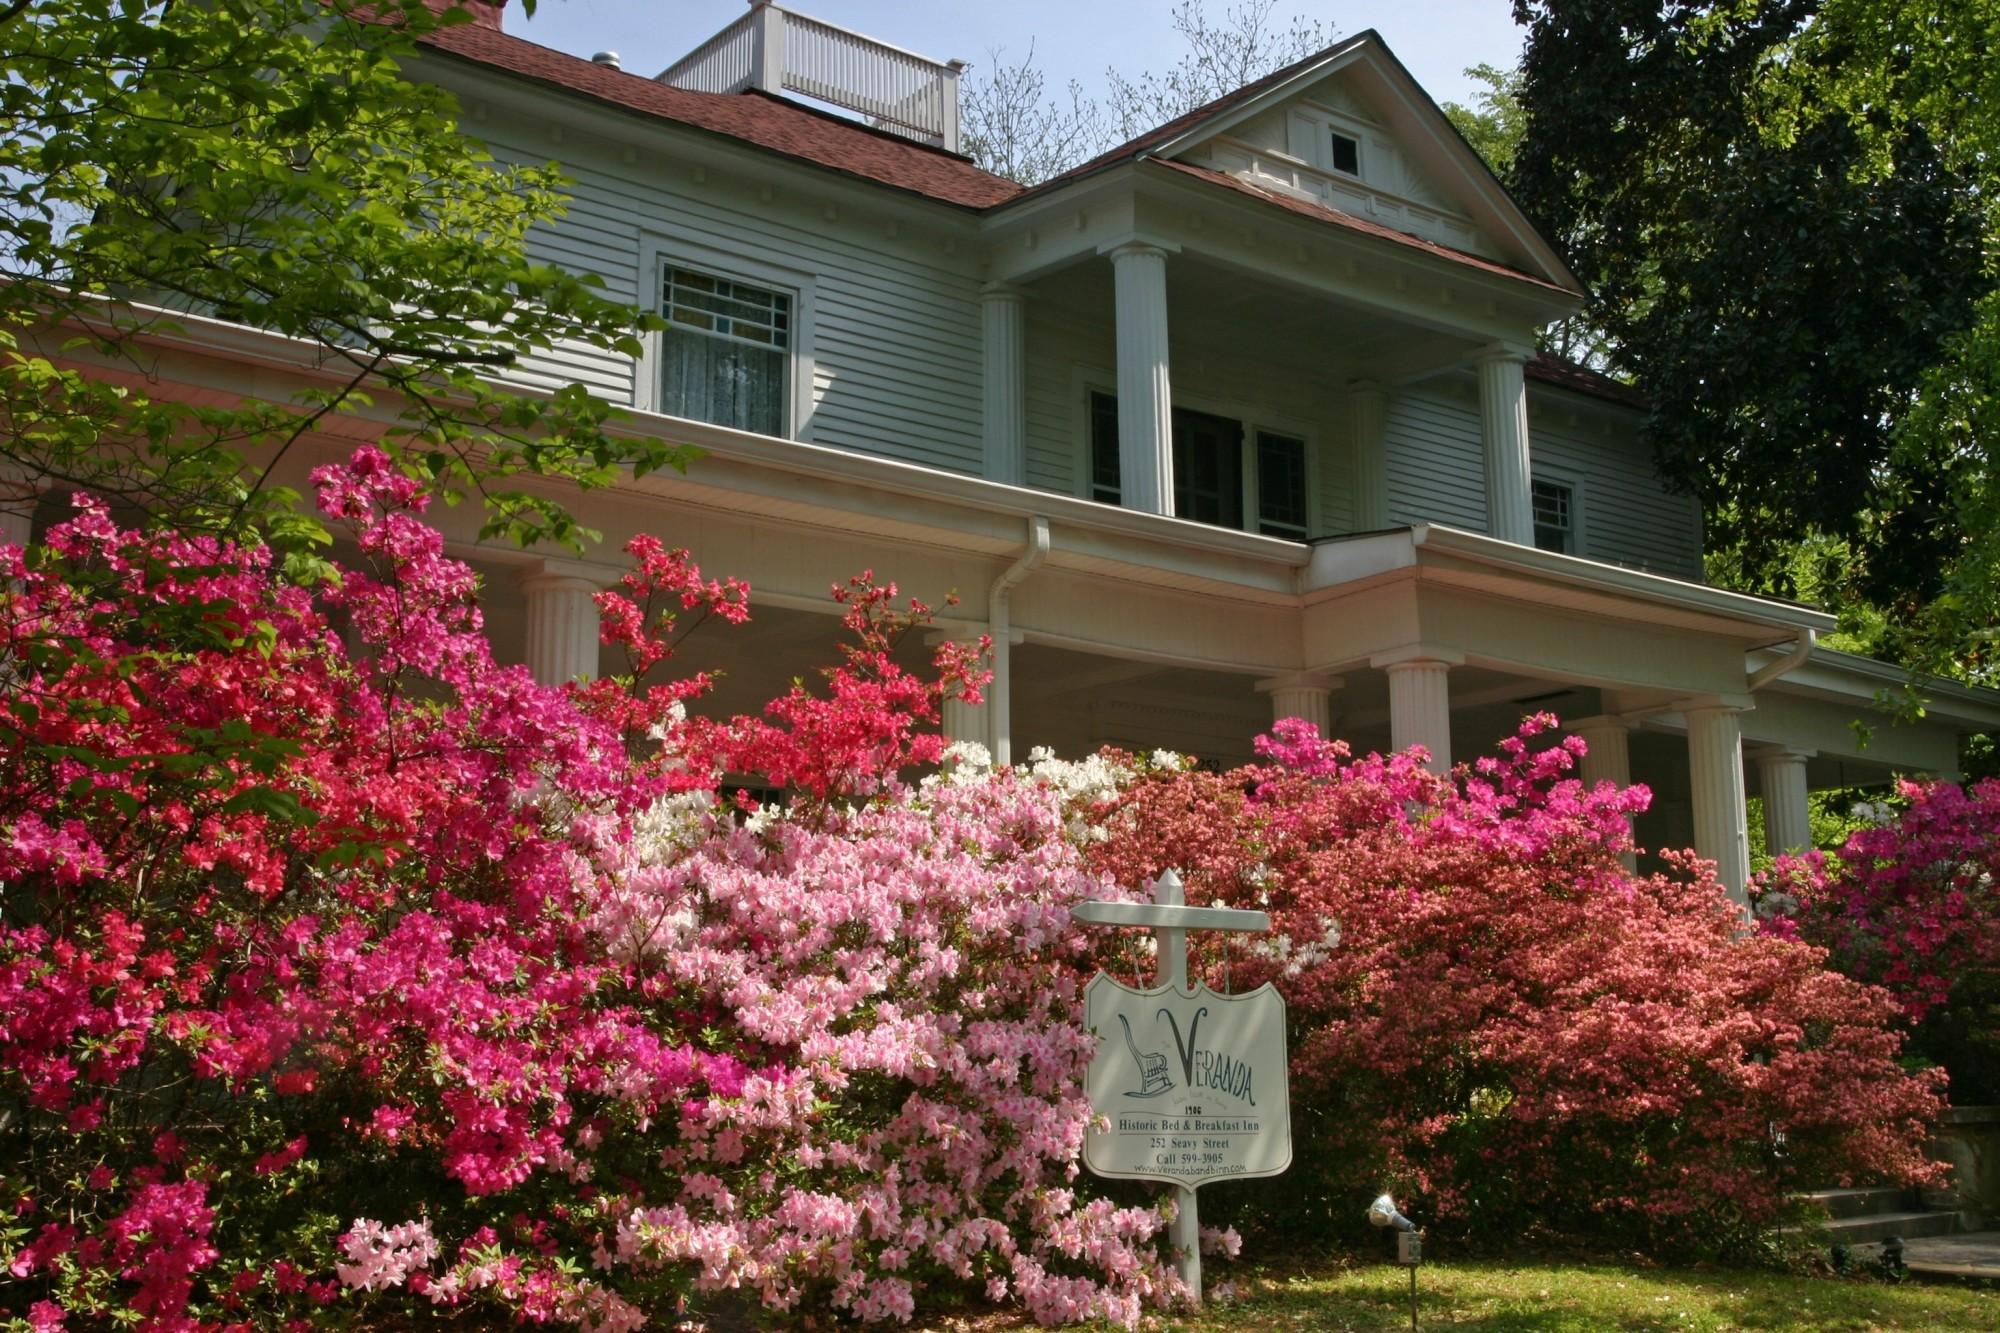 The Veranda Historic Bed Breakfast Inn Official Georgia Tourism